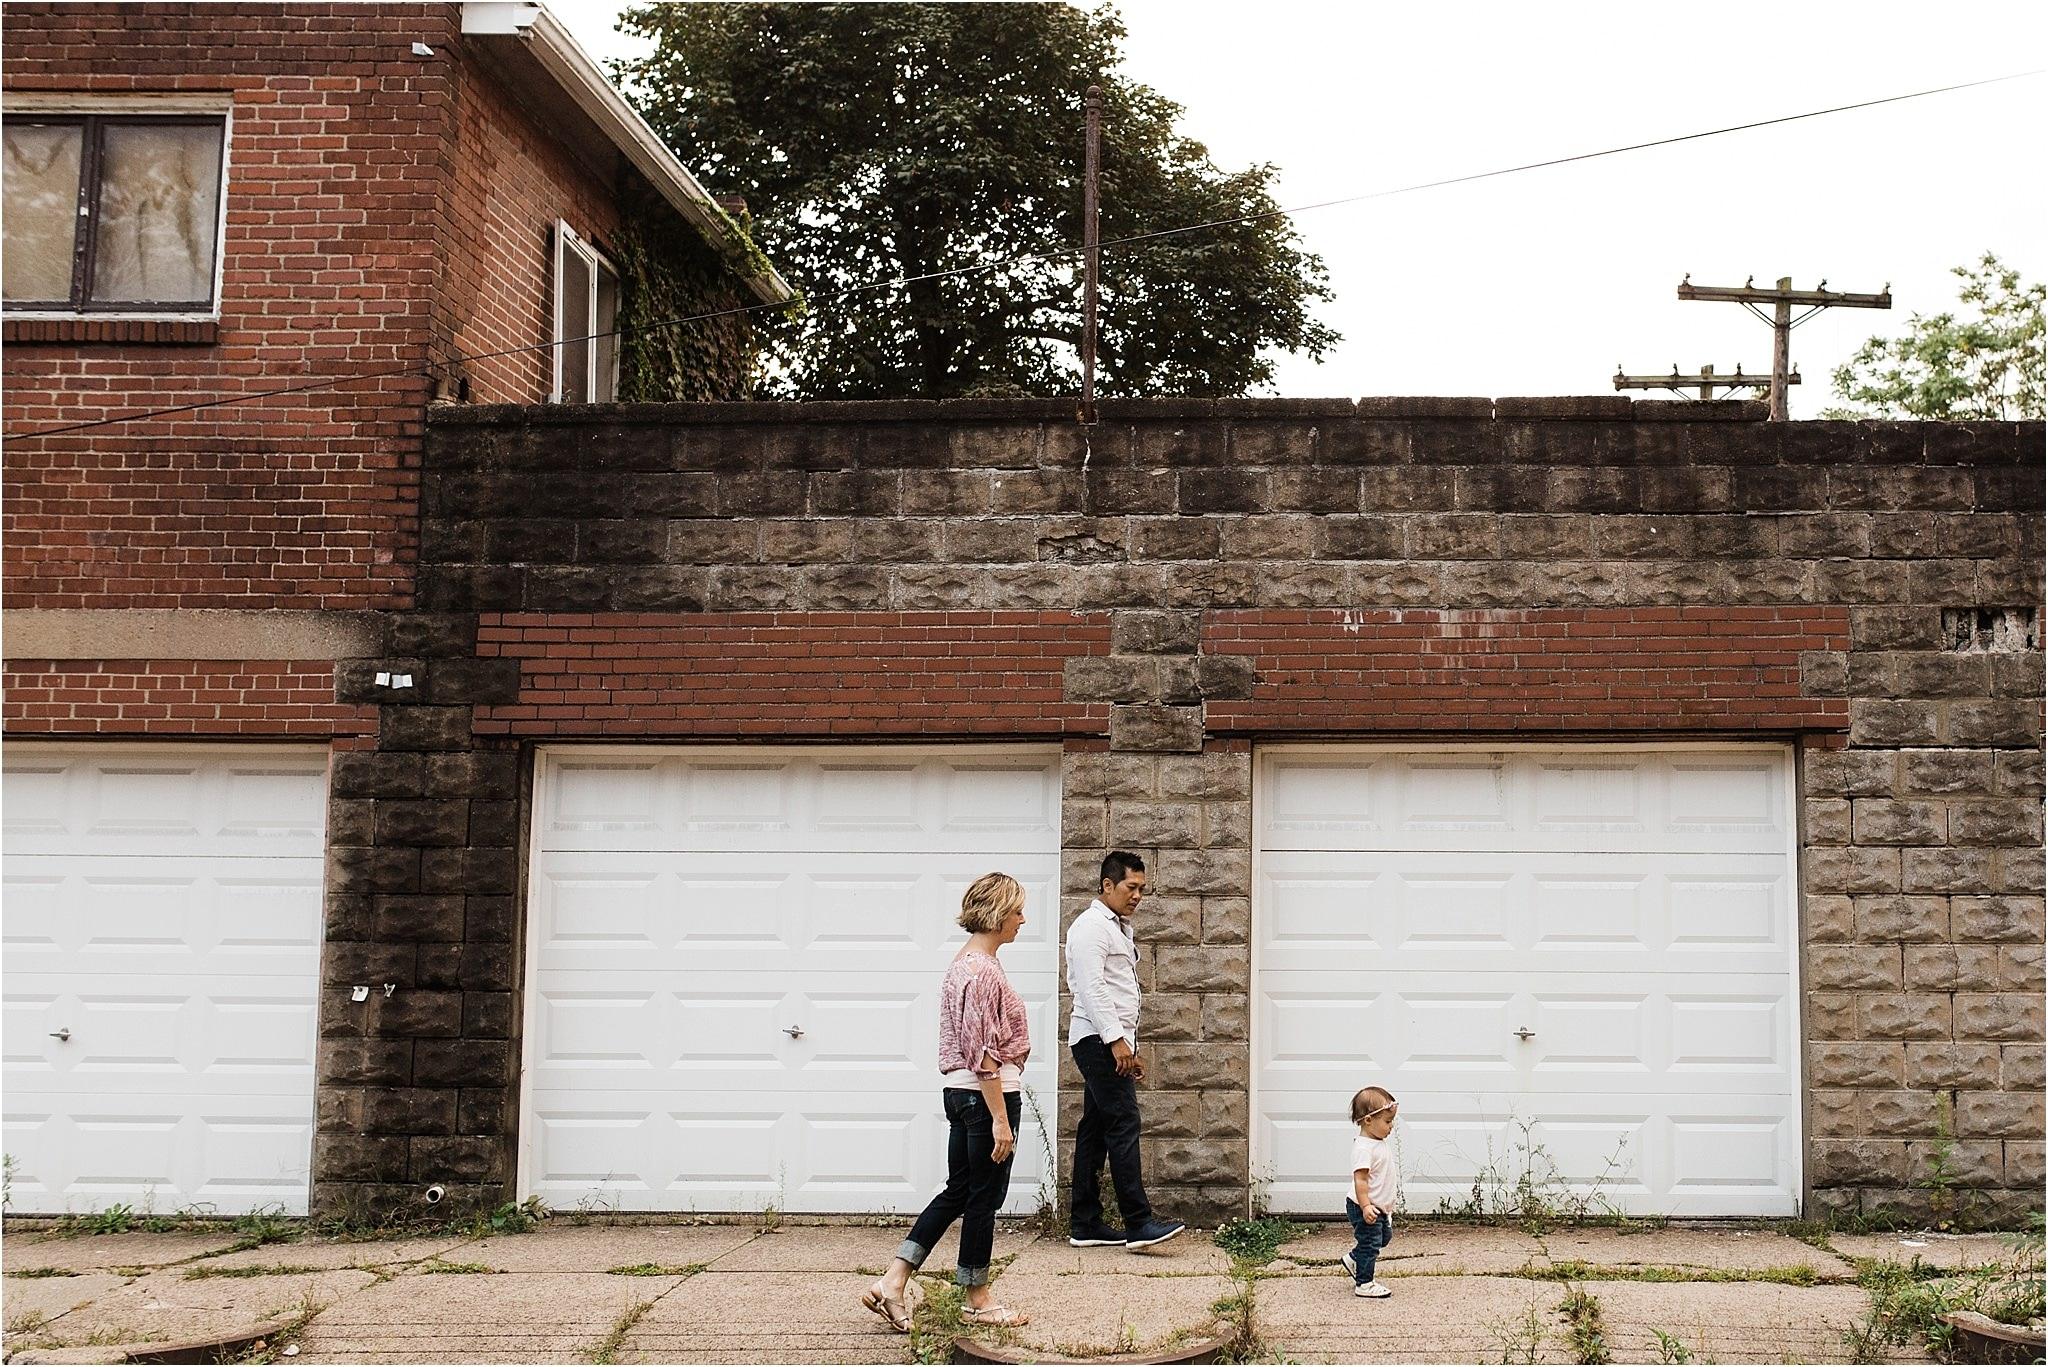 family walking in lawrenceville